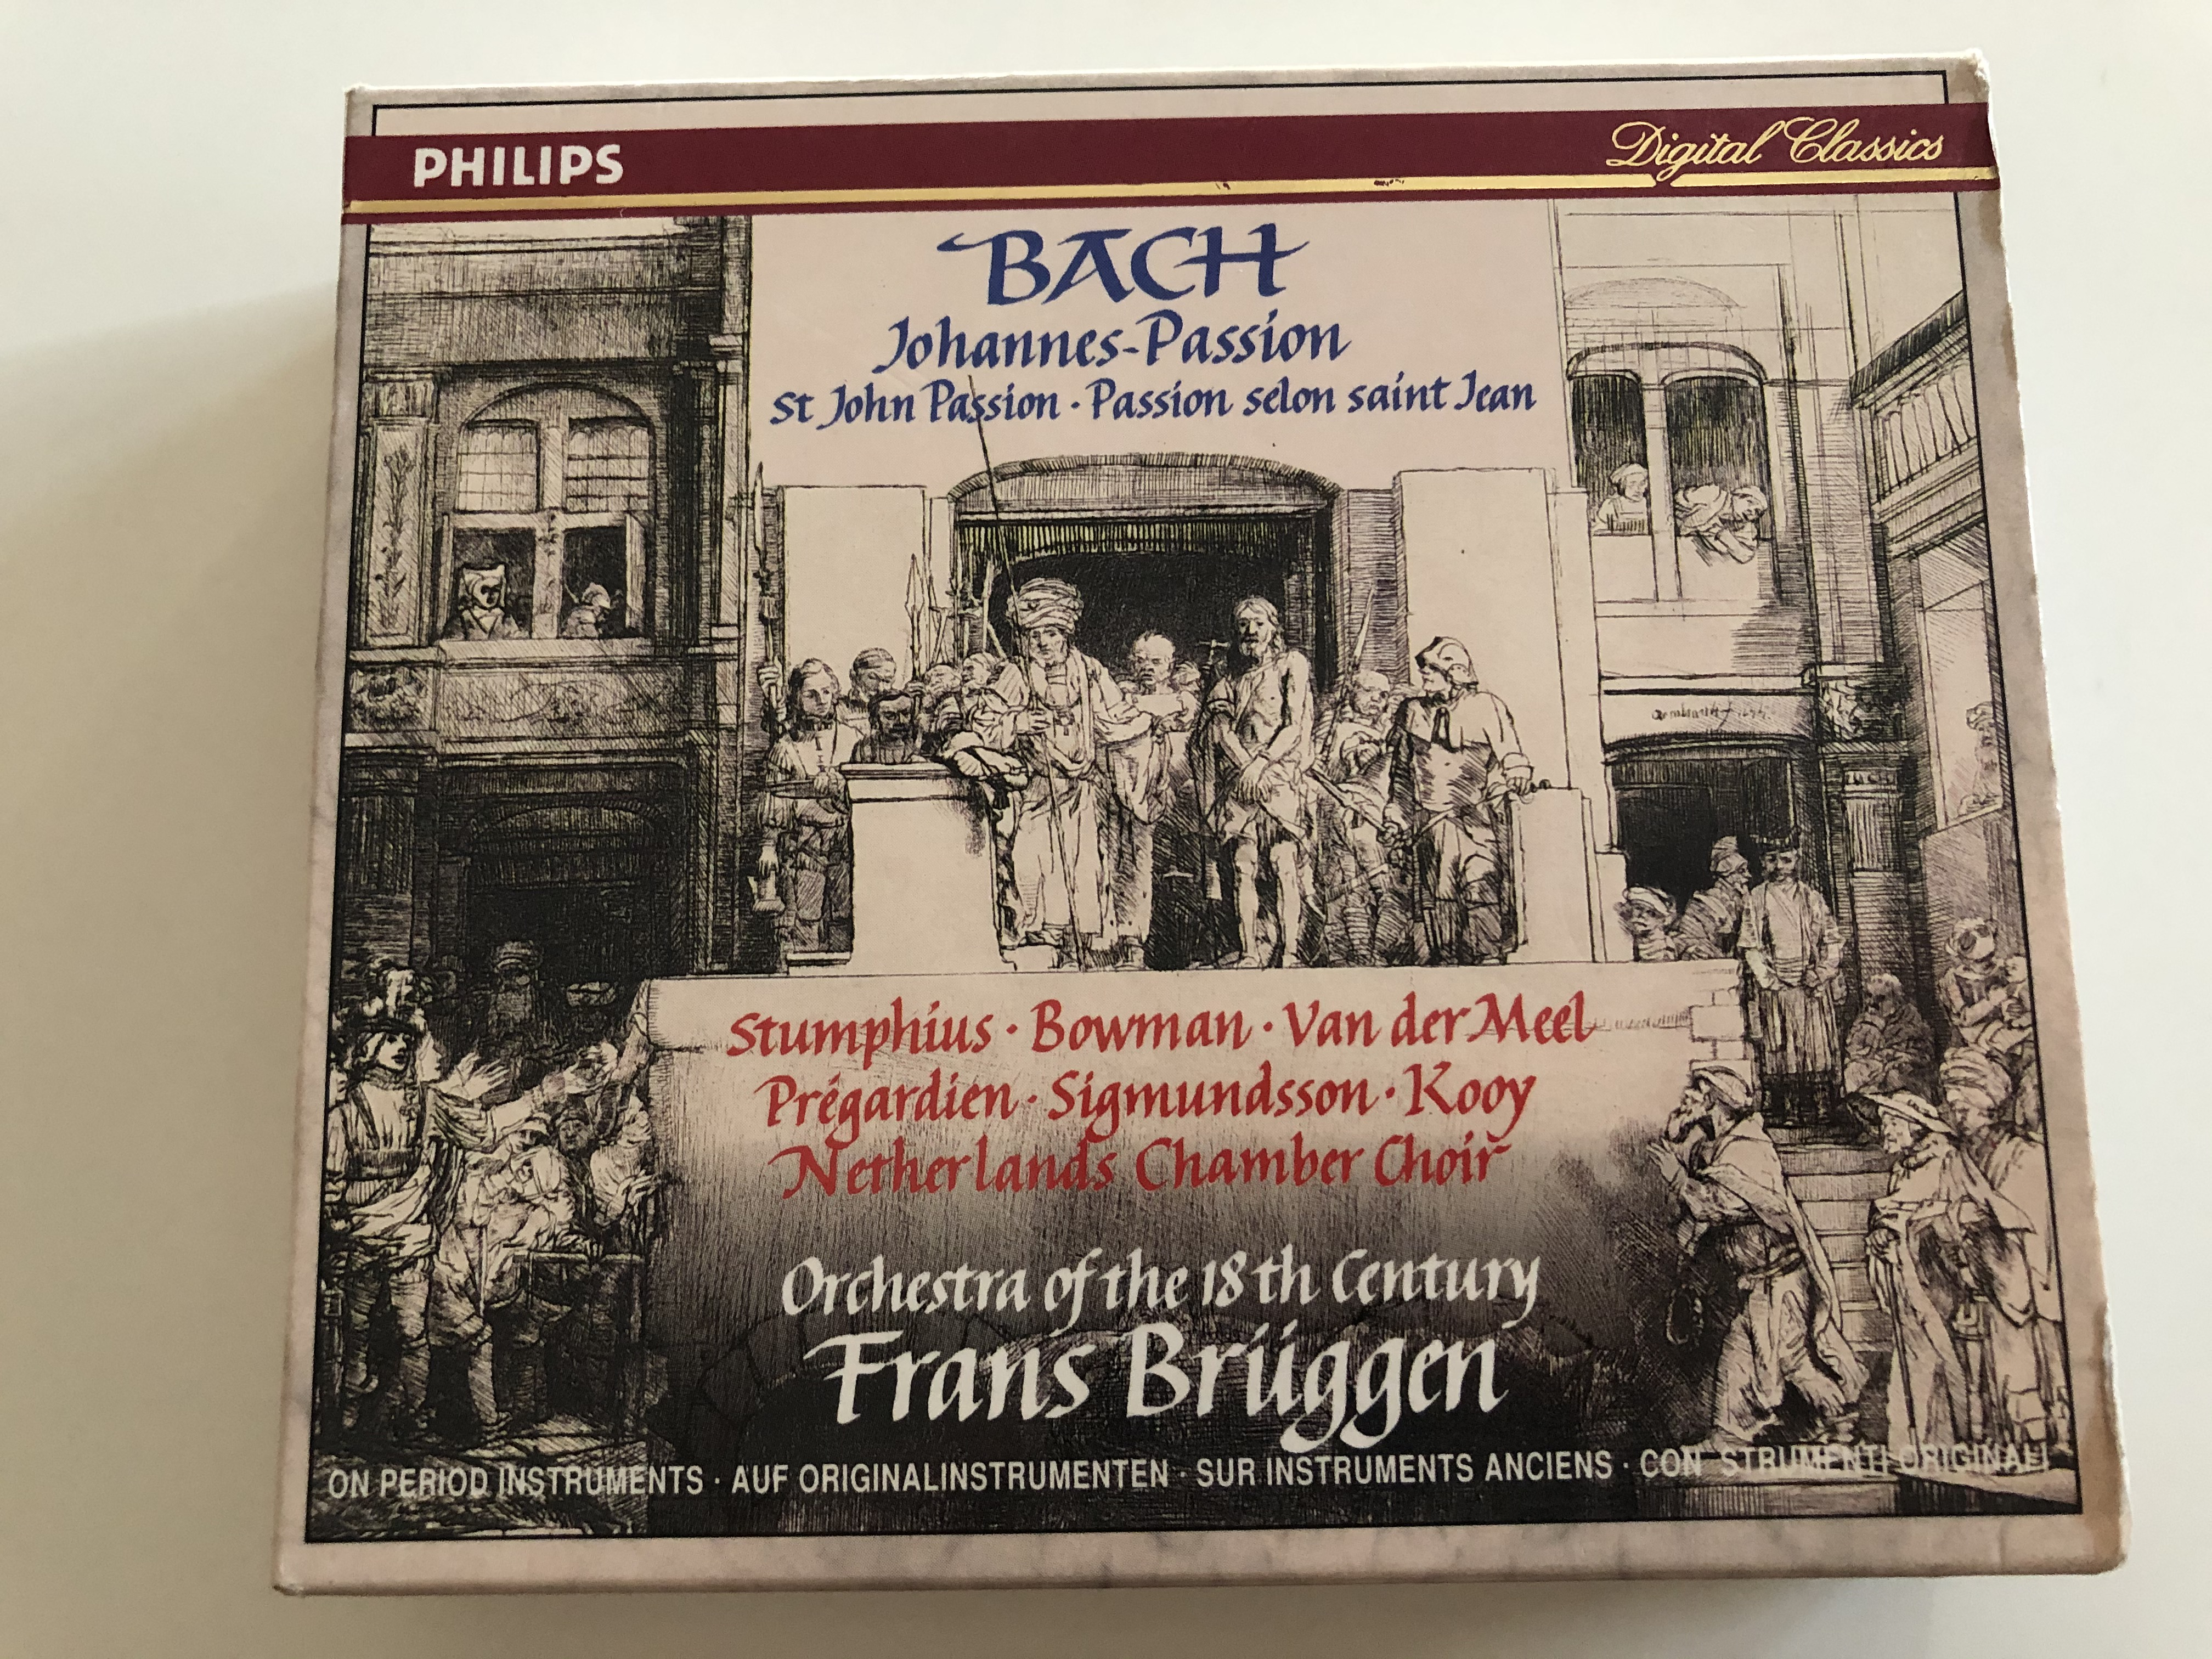 bach-johannes-passion-st-john-passion-passion-selon-saint-jean-stumphius-bowman-van-der-meel-pregardien-sigmundsson-kooy-netherlands-chamber-choir-orchestra-of-the-18th-century-frans-1-.jpg